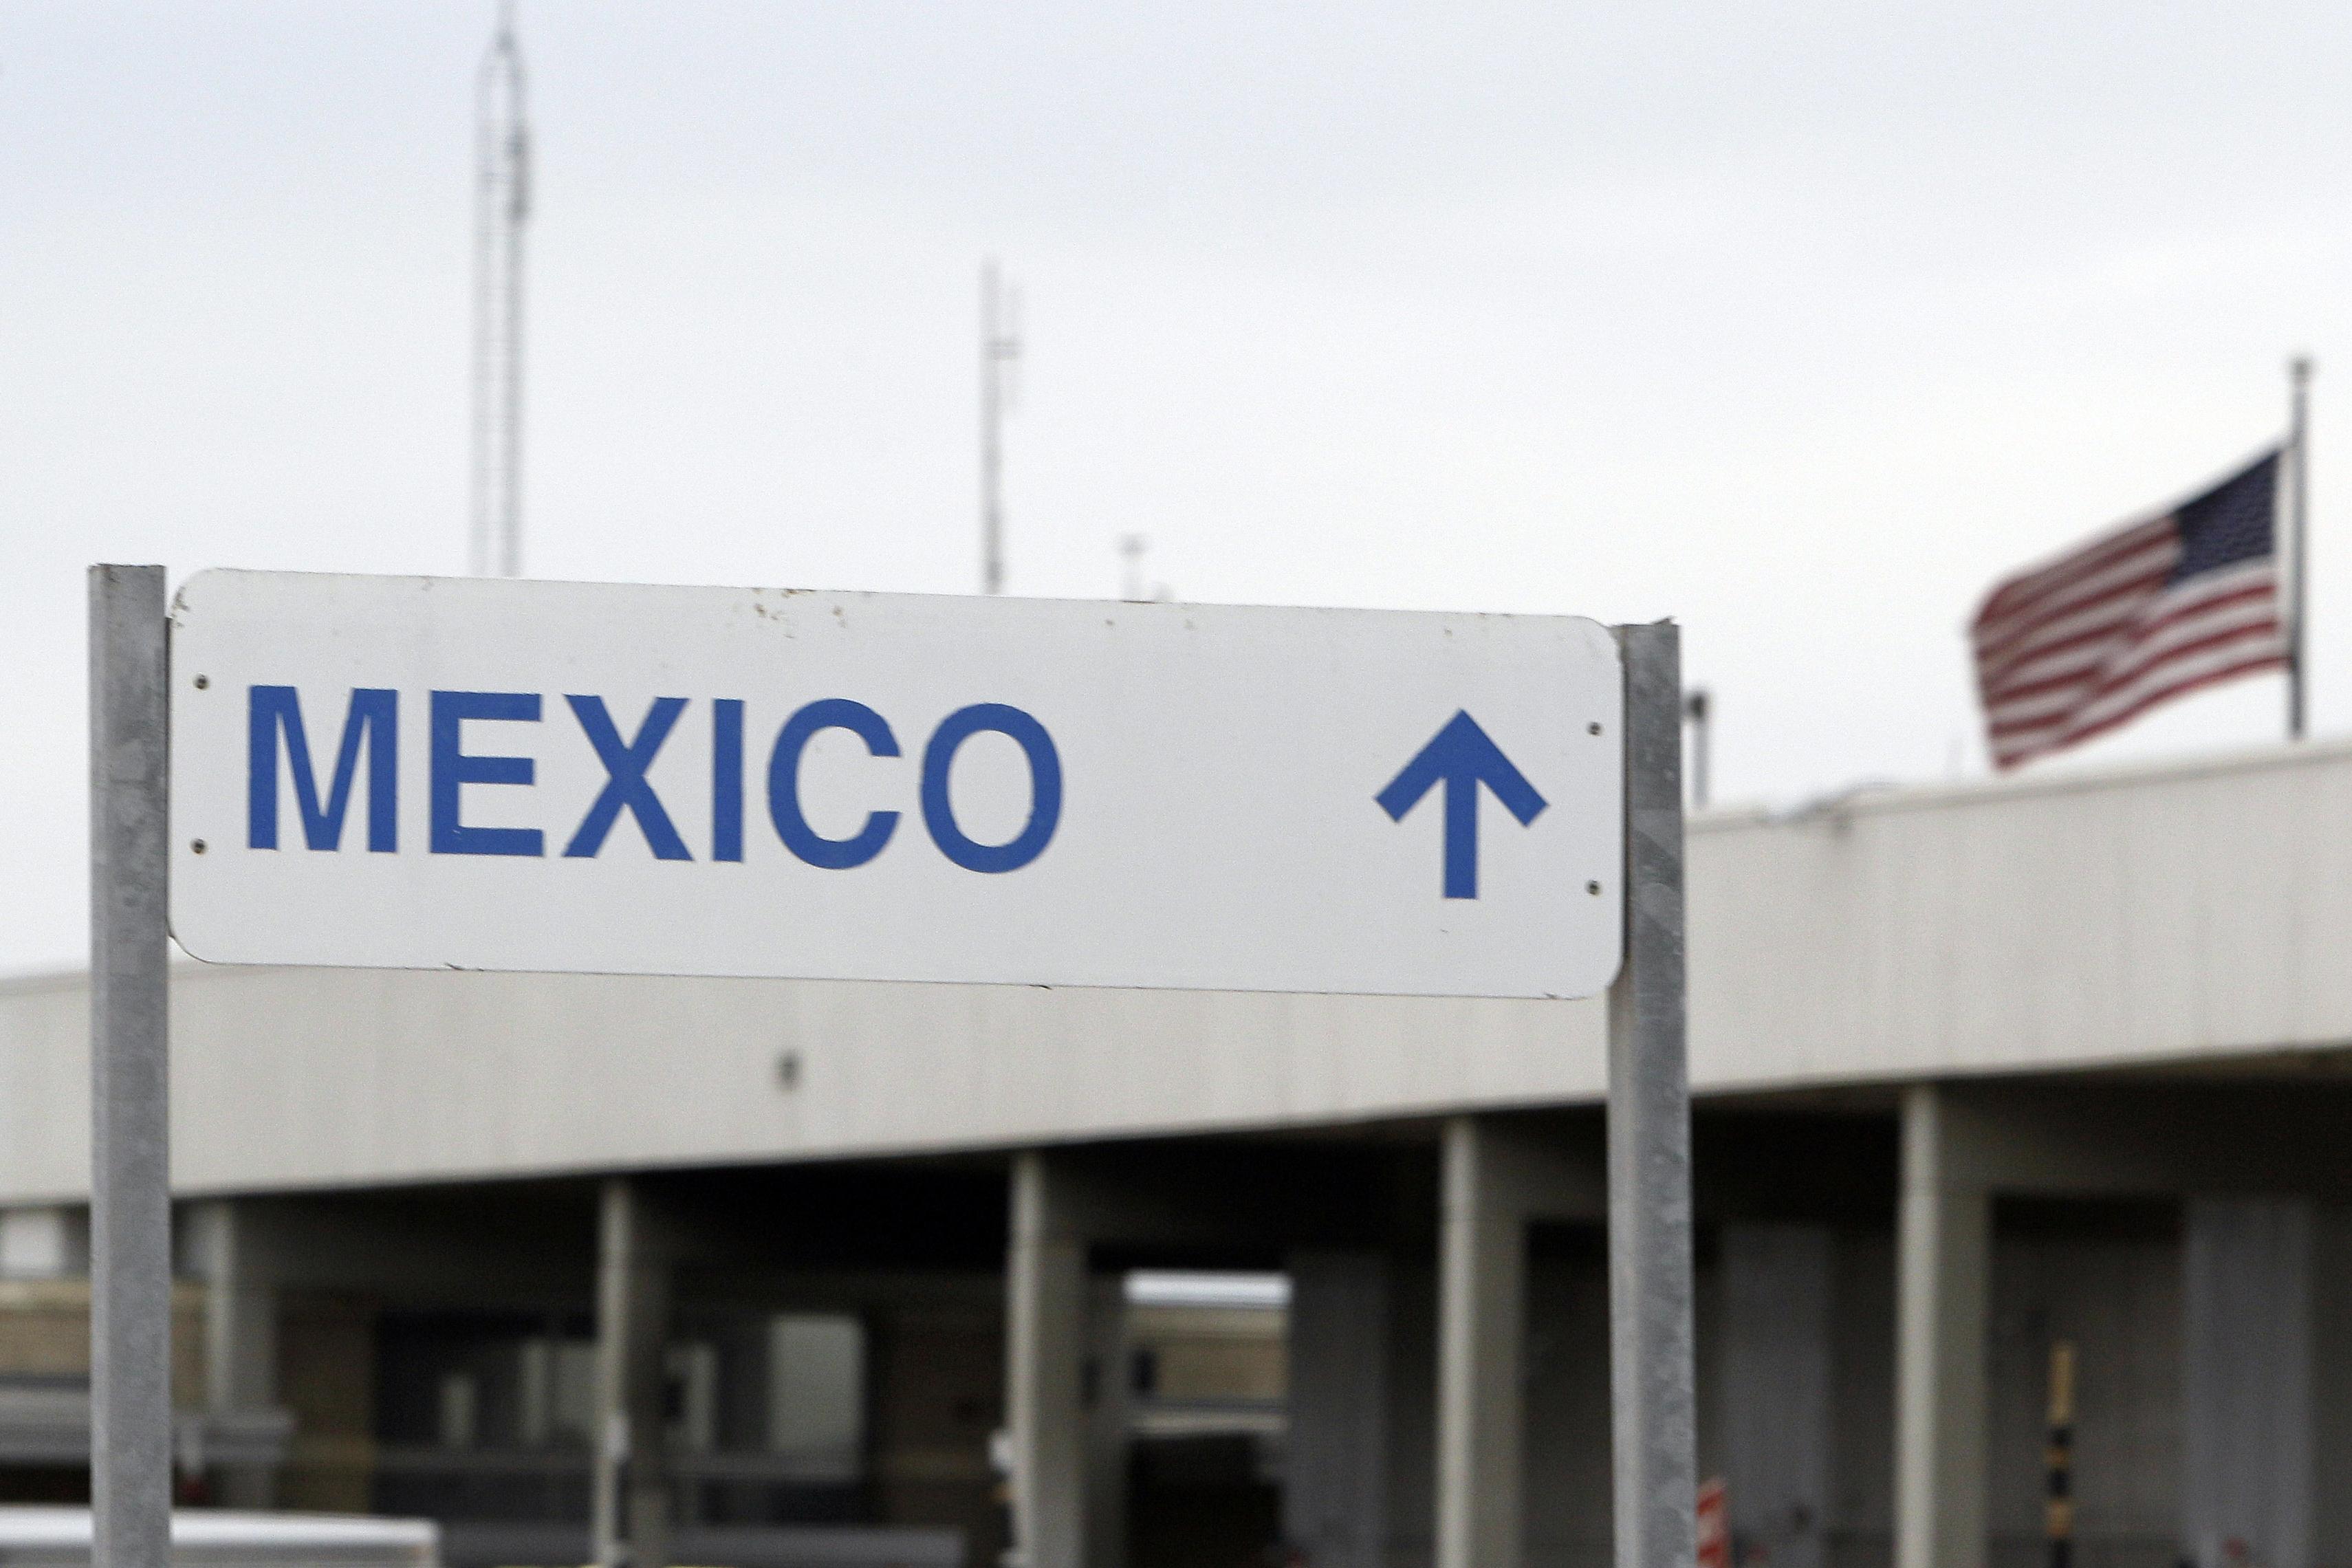 Pharr International Bridge crossing into Reynosa, Mexico